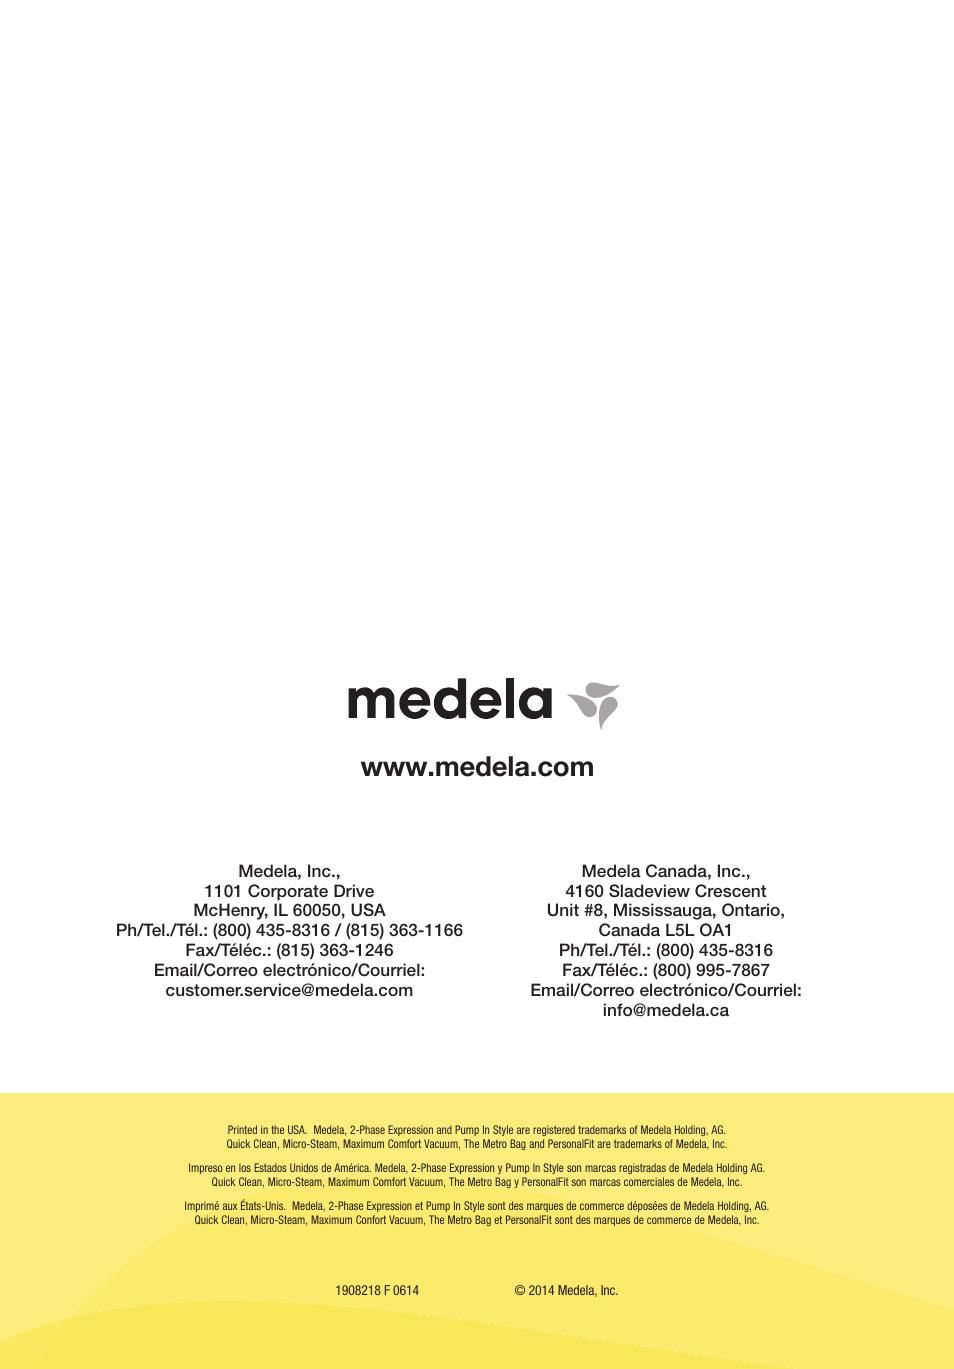 medela pump in style user manual page 100 100 original mode rh manualsdir com Medela Manual Pump medela pump in style advanced user manual